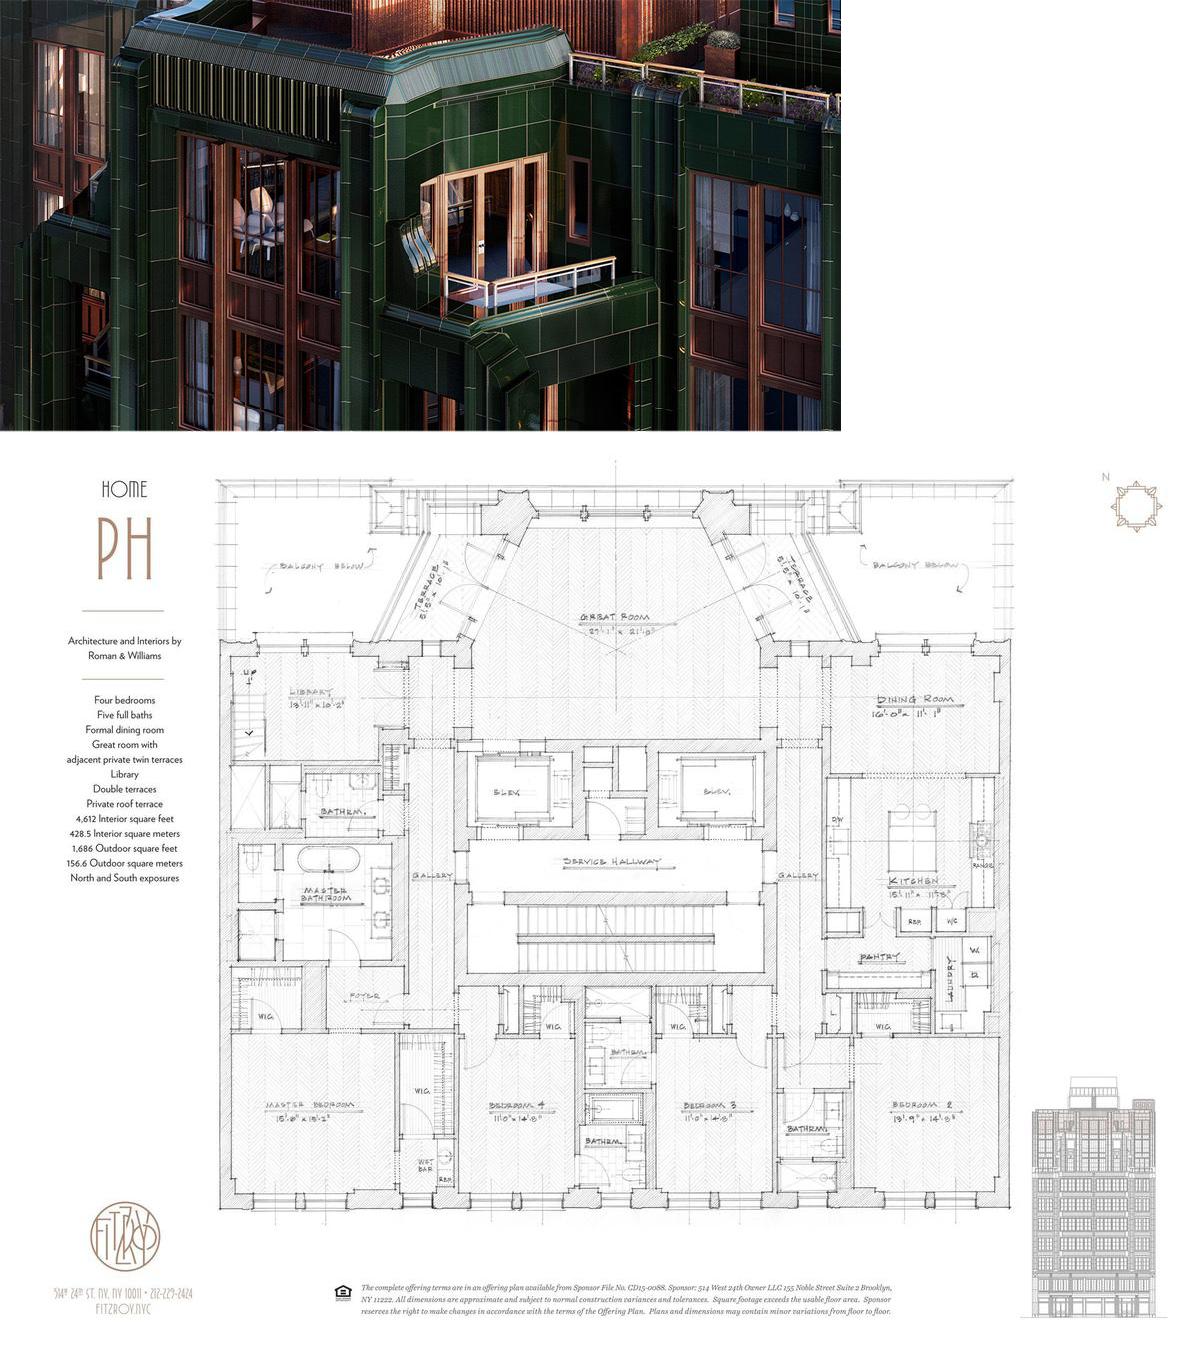 514 West 24th St Ph In West Chelsea Manhattan Streeteasy Floor Plans Pent House Condominium